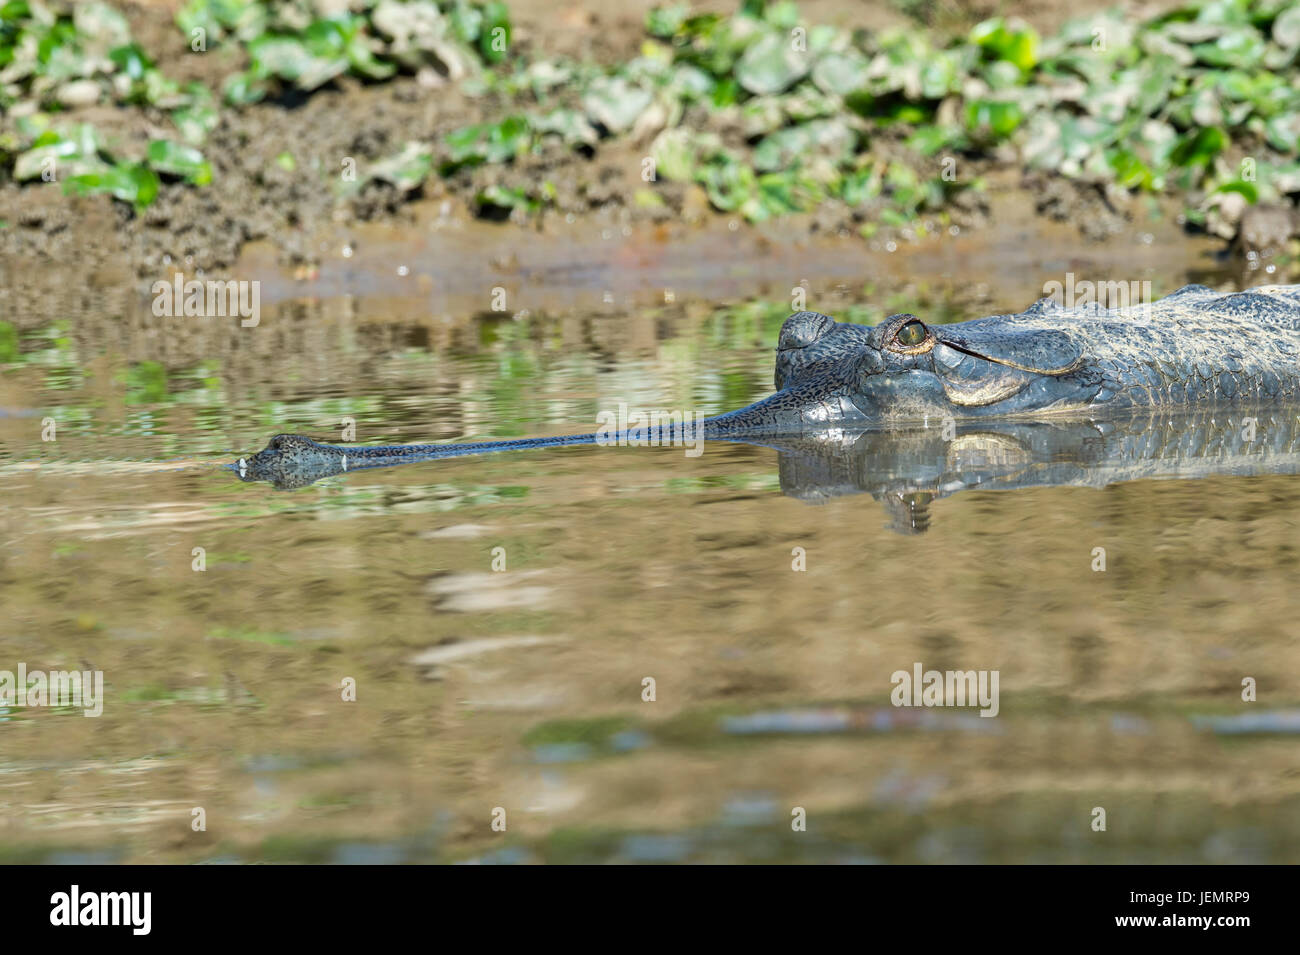 Gharial (Gavialis gangeticus) or gavial in the water, Critically Endangered species, Crocodylidae Family, Chitwan - Stock Image